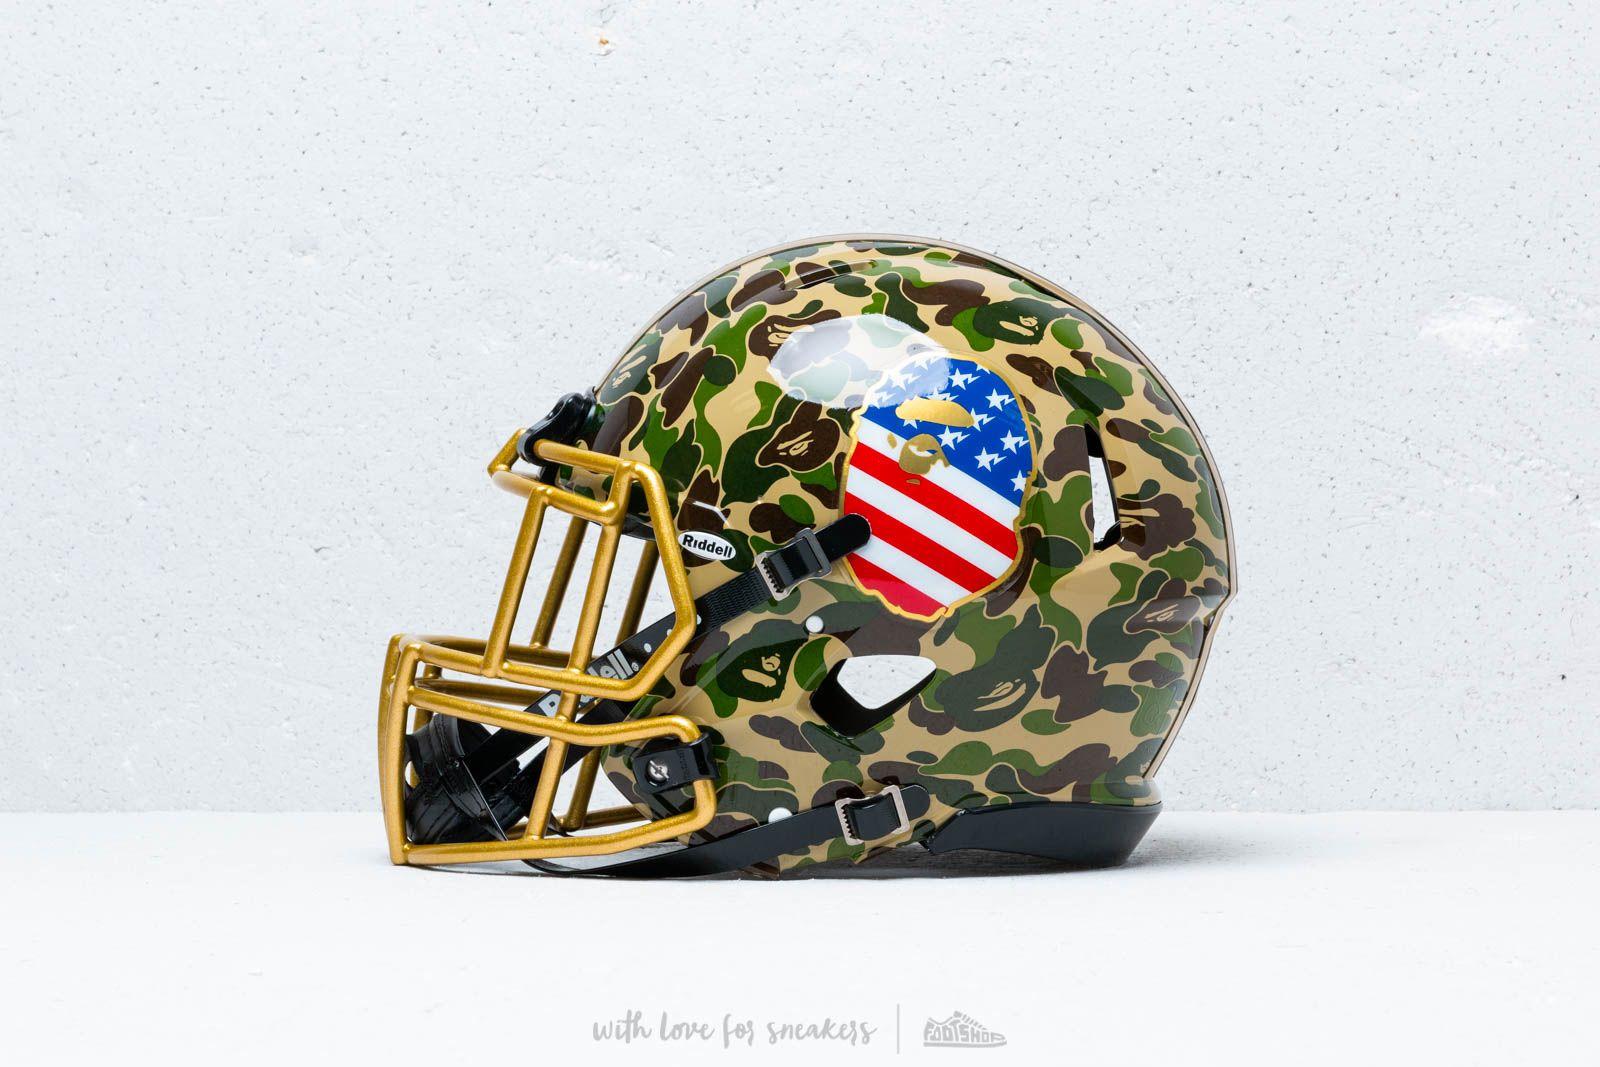 adidas x BAPE x Riddell Helmet